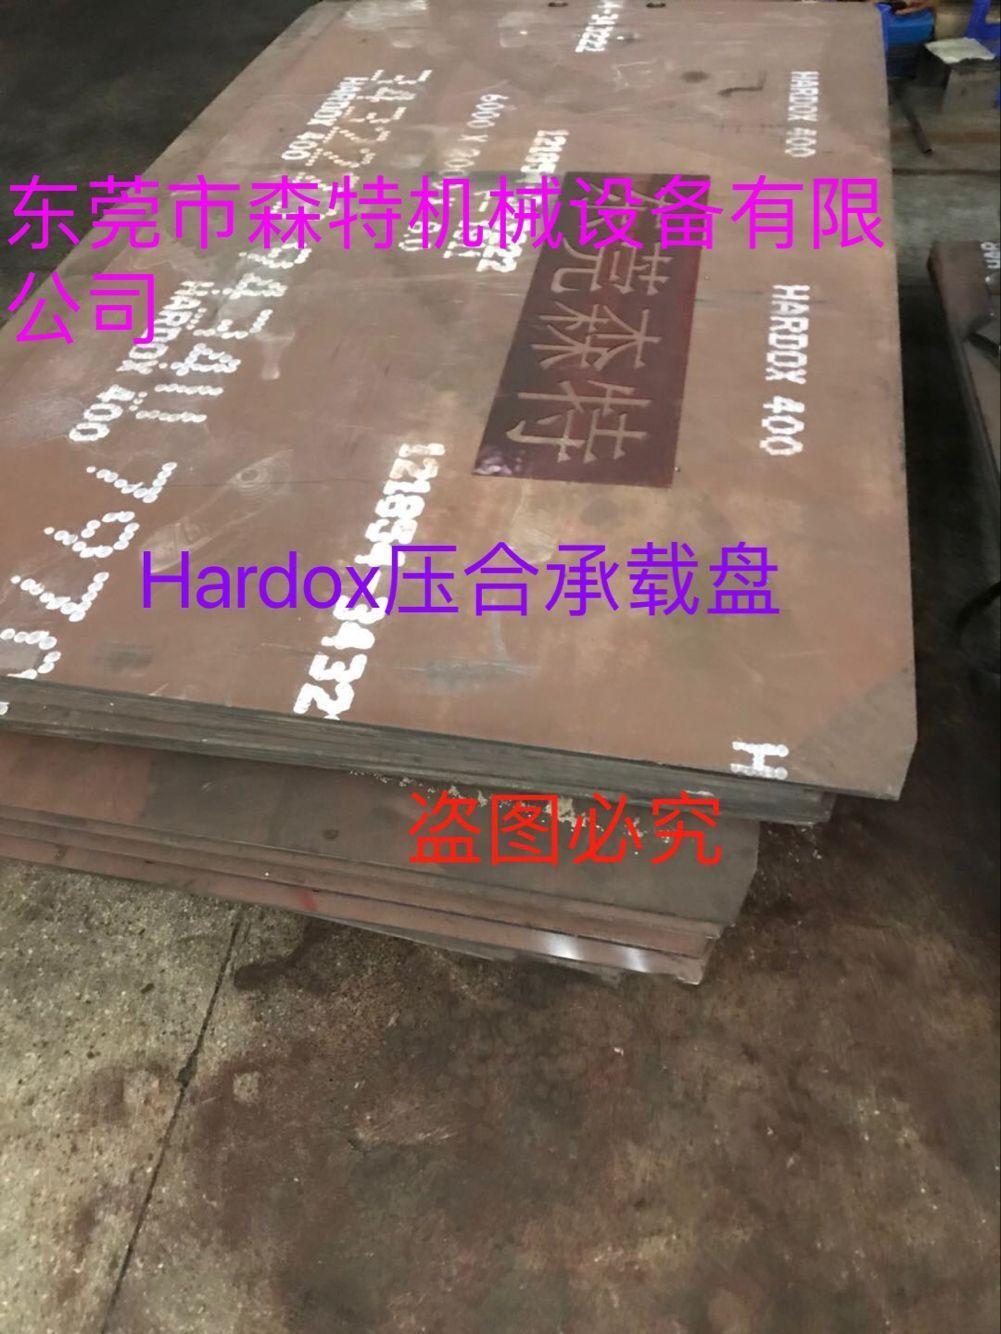 HARDOX壓合承載盤上蓋板底盤 4